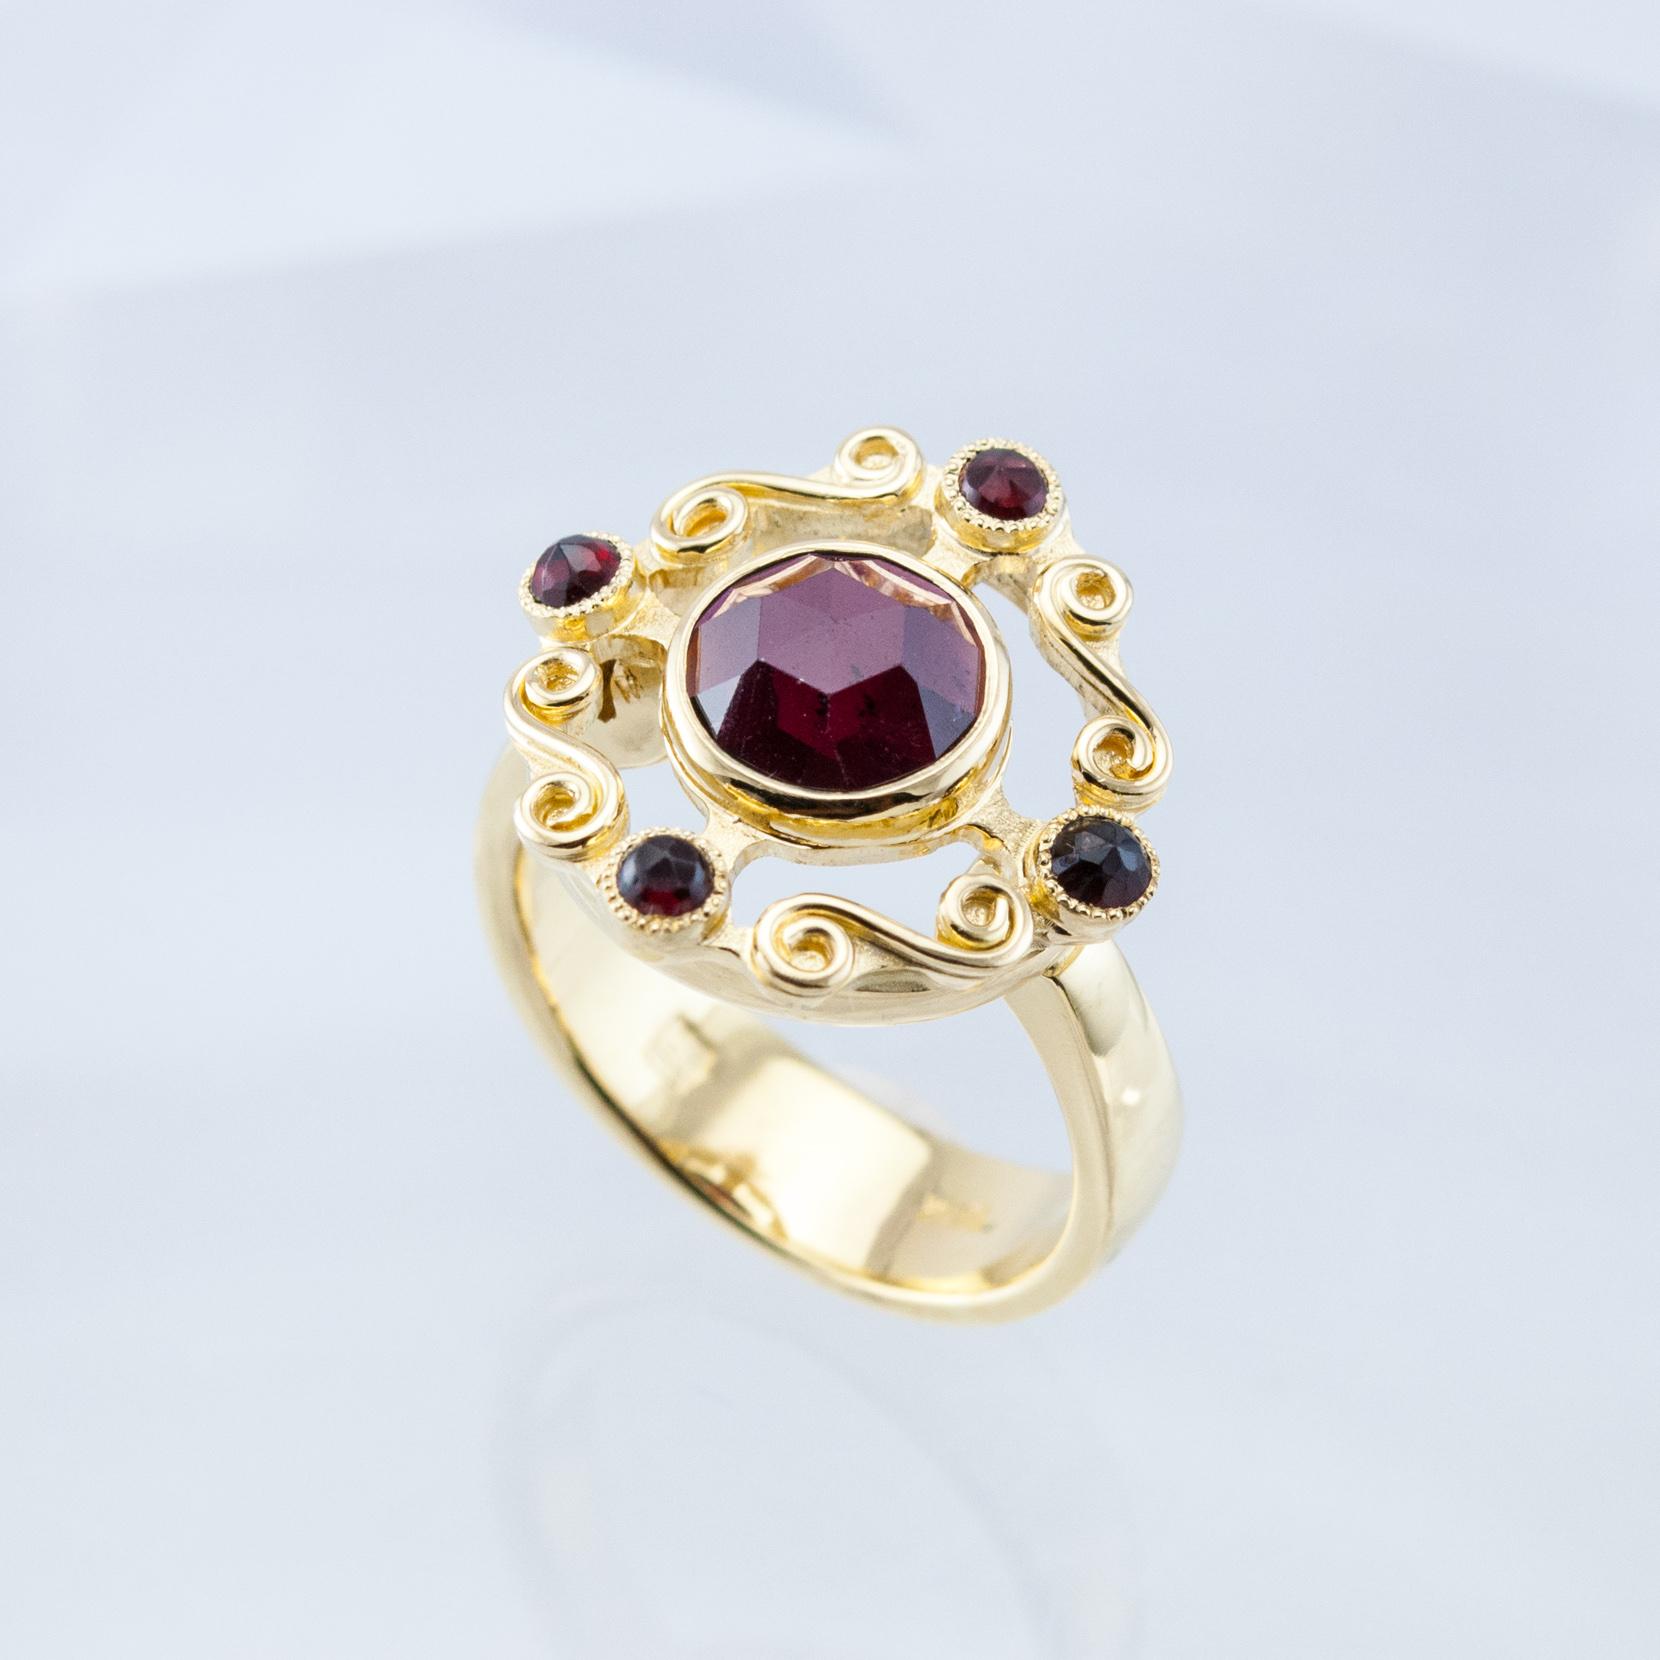 Spiral Crown Ring with Garnet